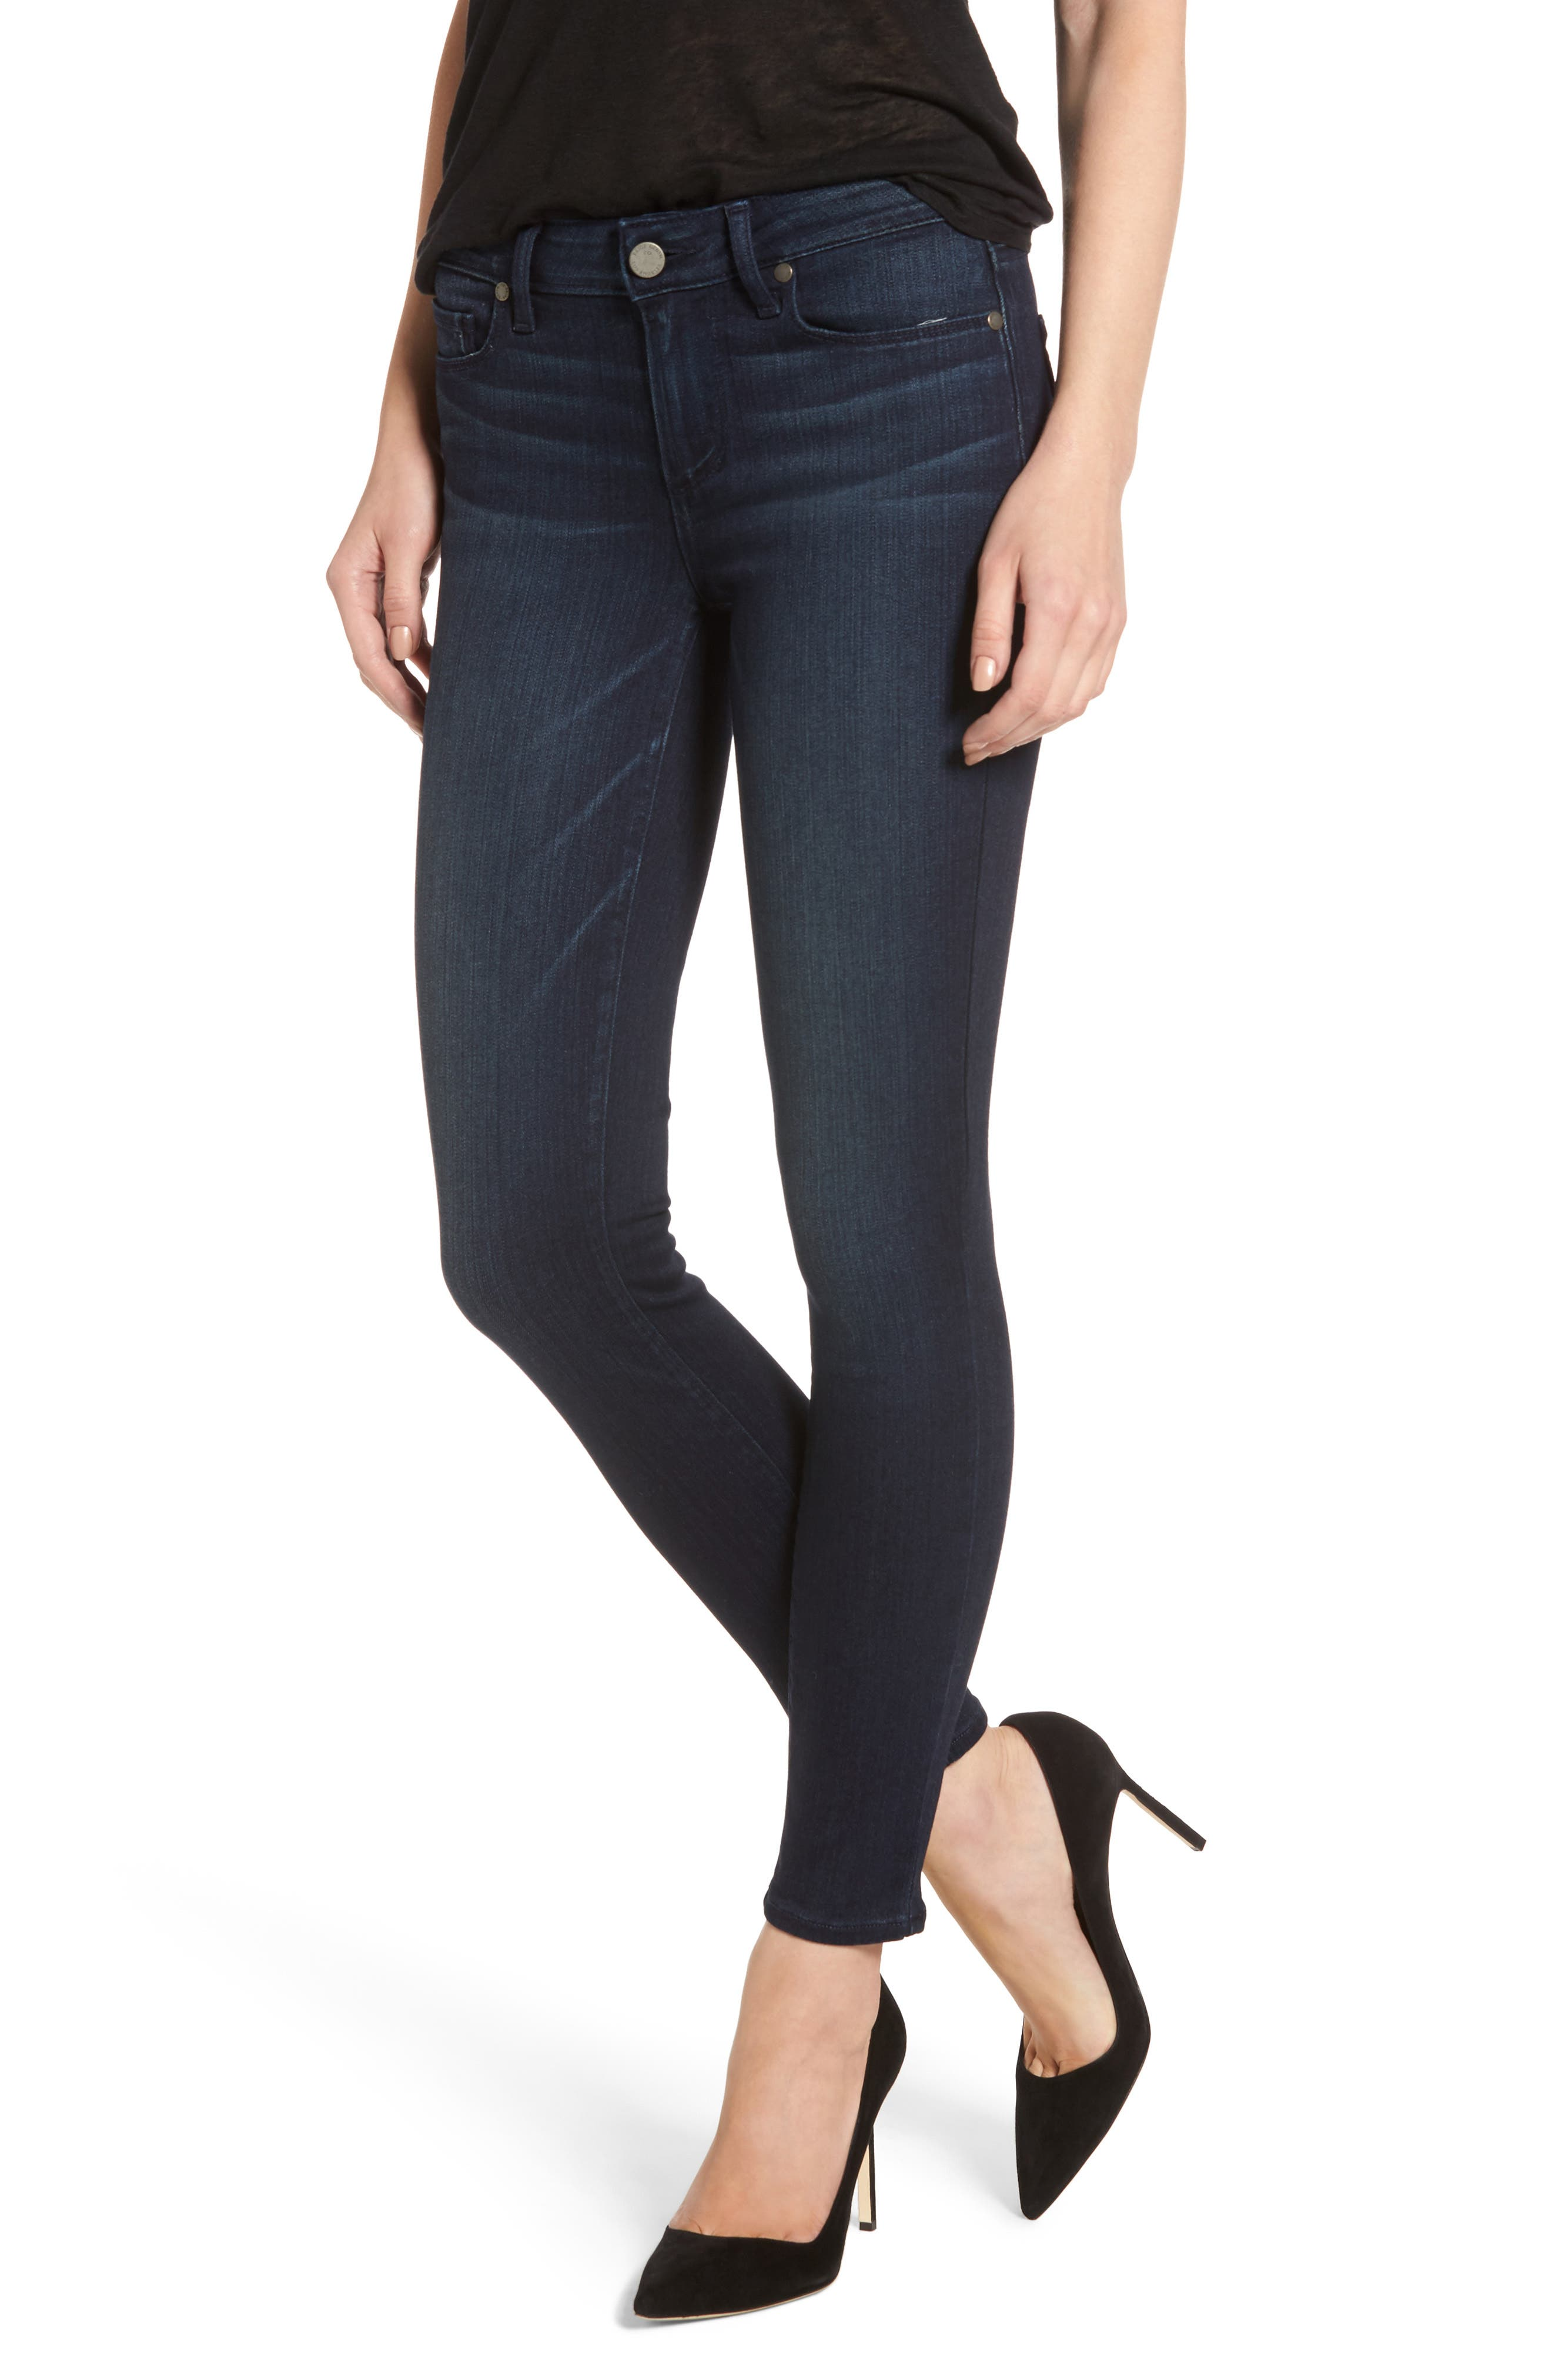 Transcend - Verdugo Ankle Skinny Jeans, Main, color, MIDLAKE